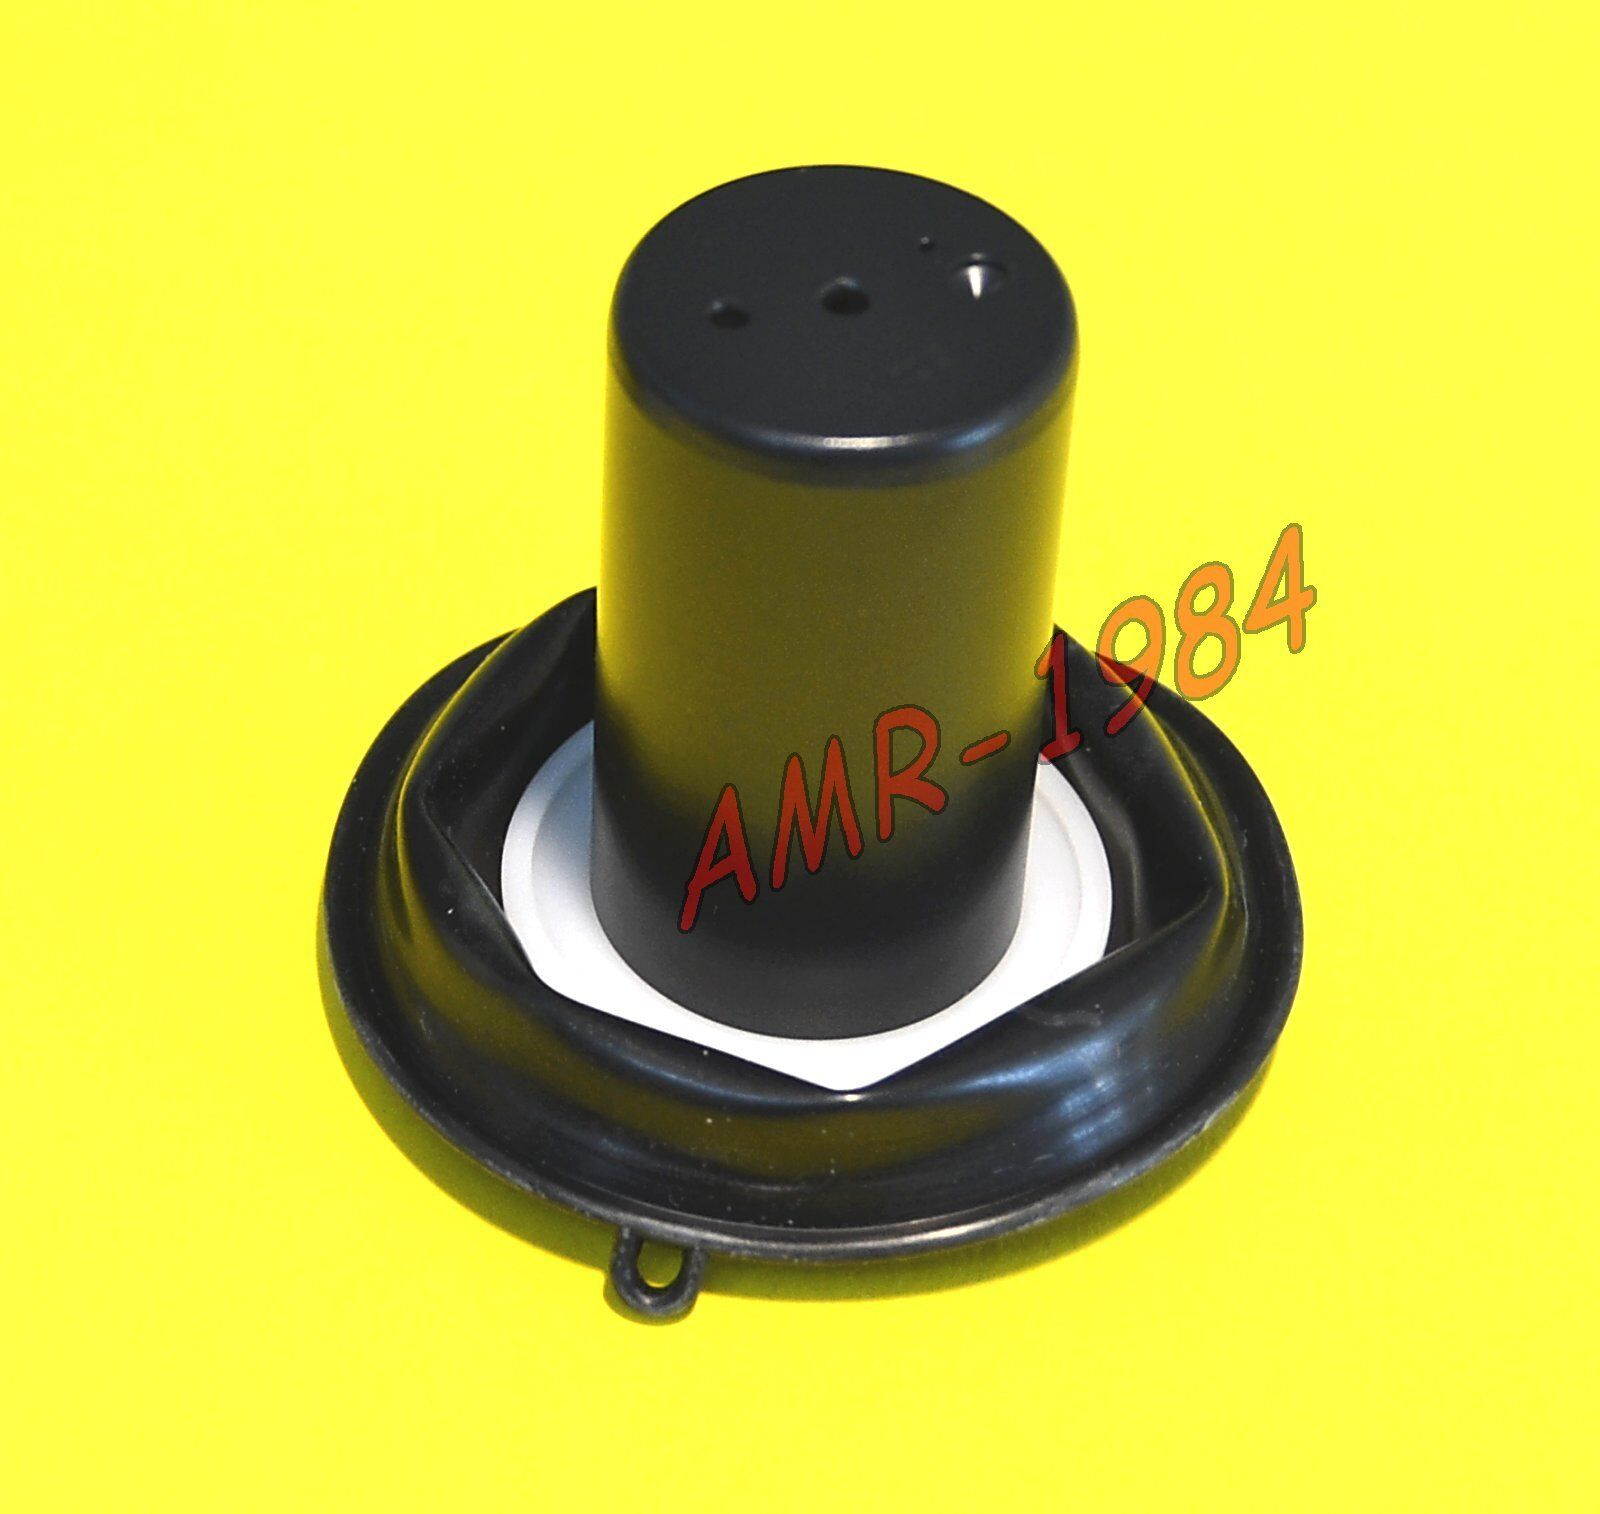 20x bulloni della ruota bulloni ruota m12x1,5mm 20mm per CITROEN PEUGEOT TOYOTA 5405.77